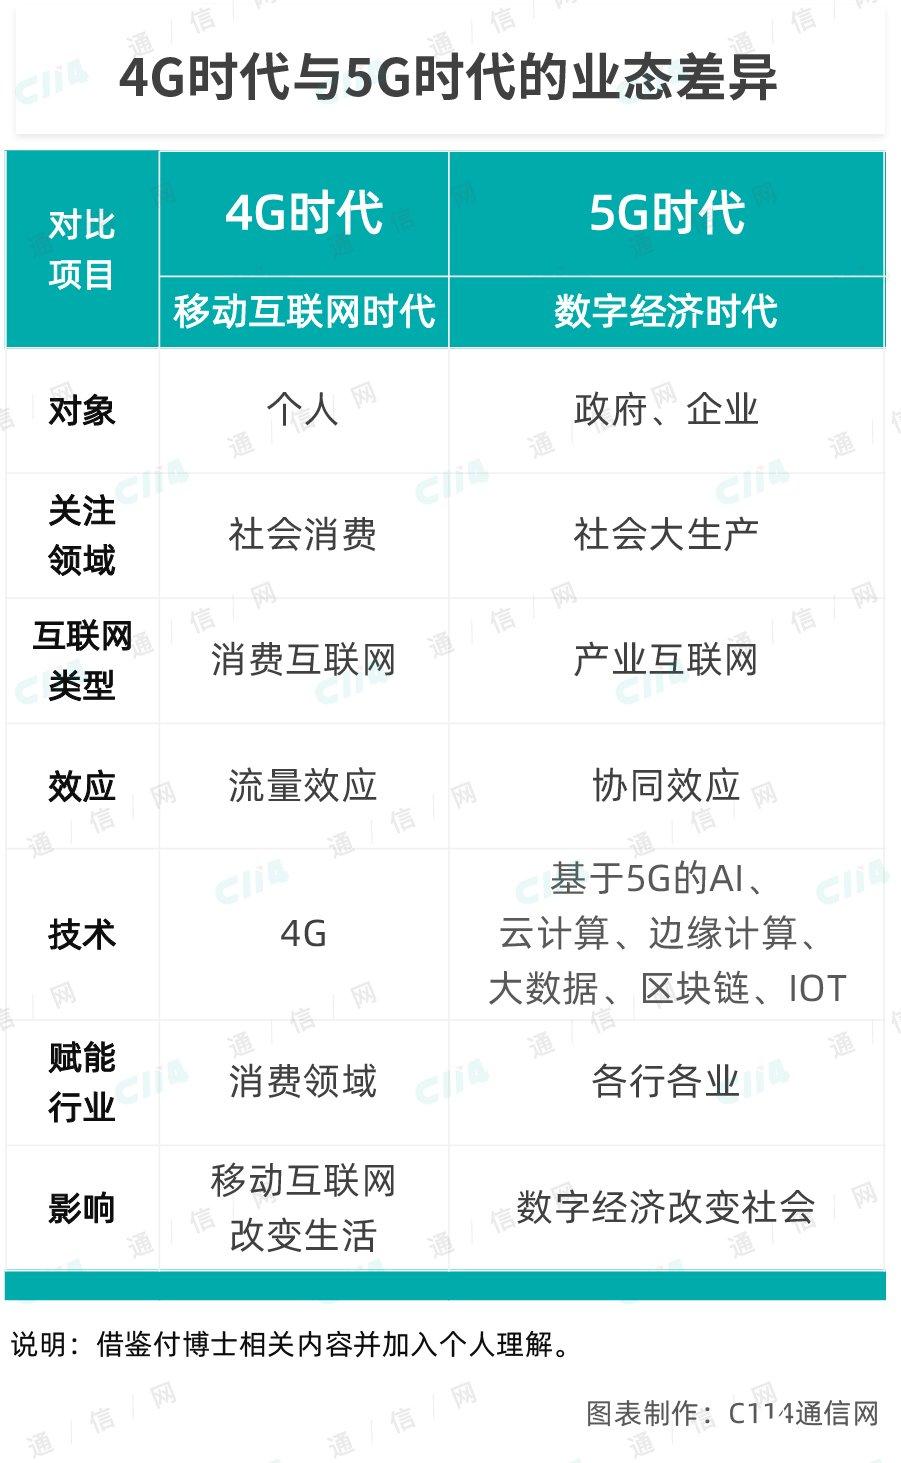 5G已经成为了2020年运营商加码的必然趋势